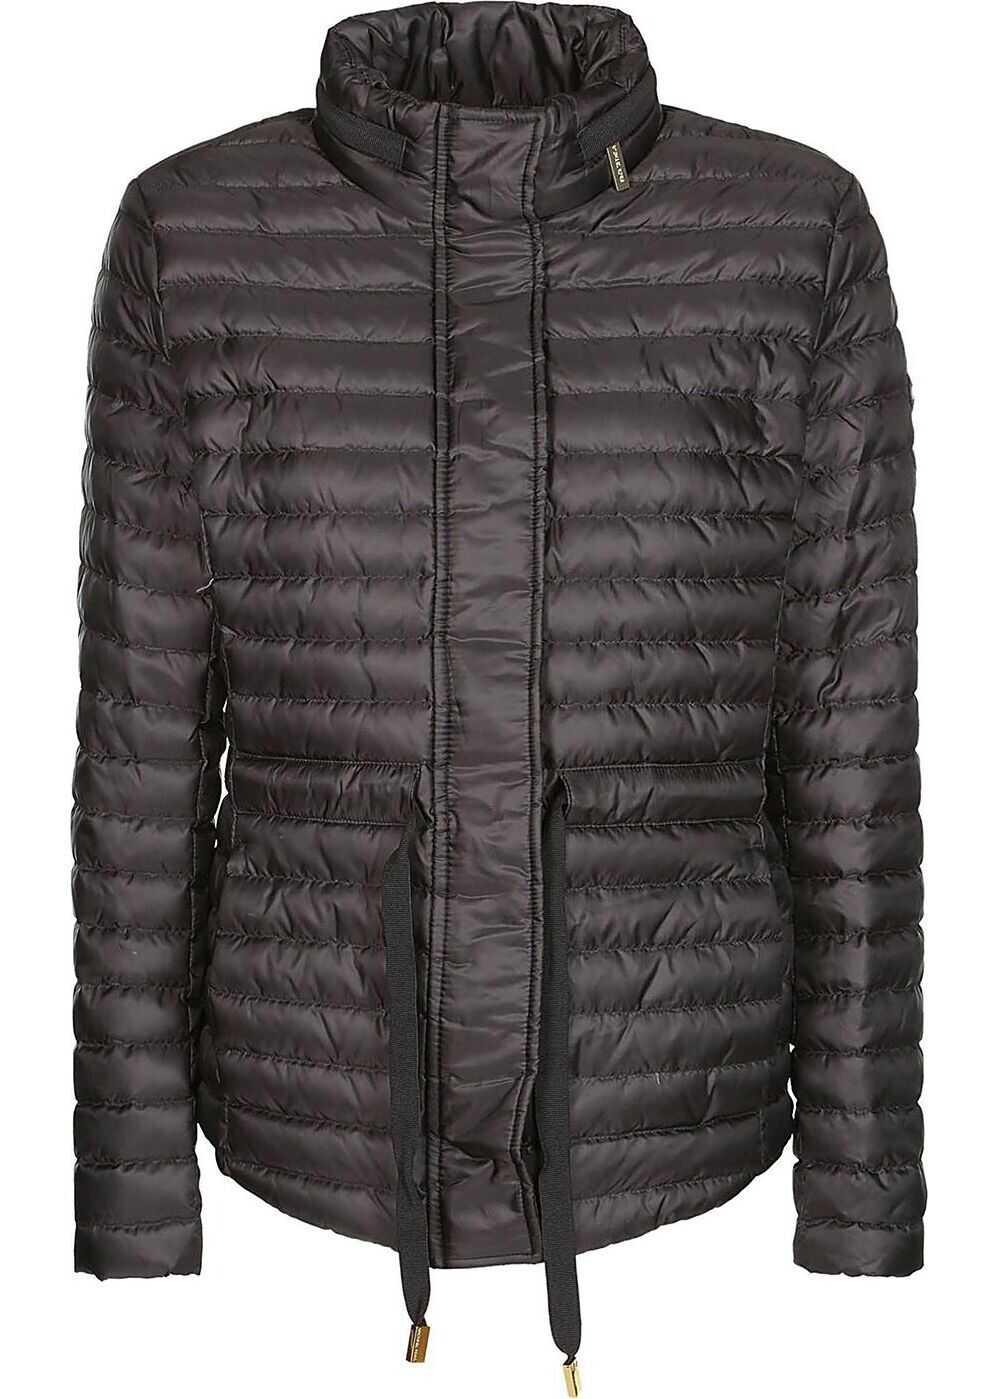 Michael Kors Polyester Outerwear Jacket BLACK